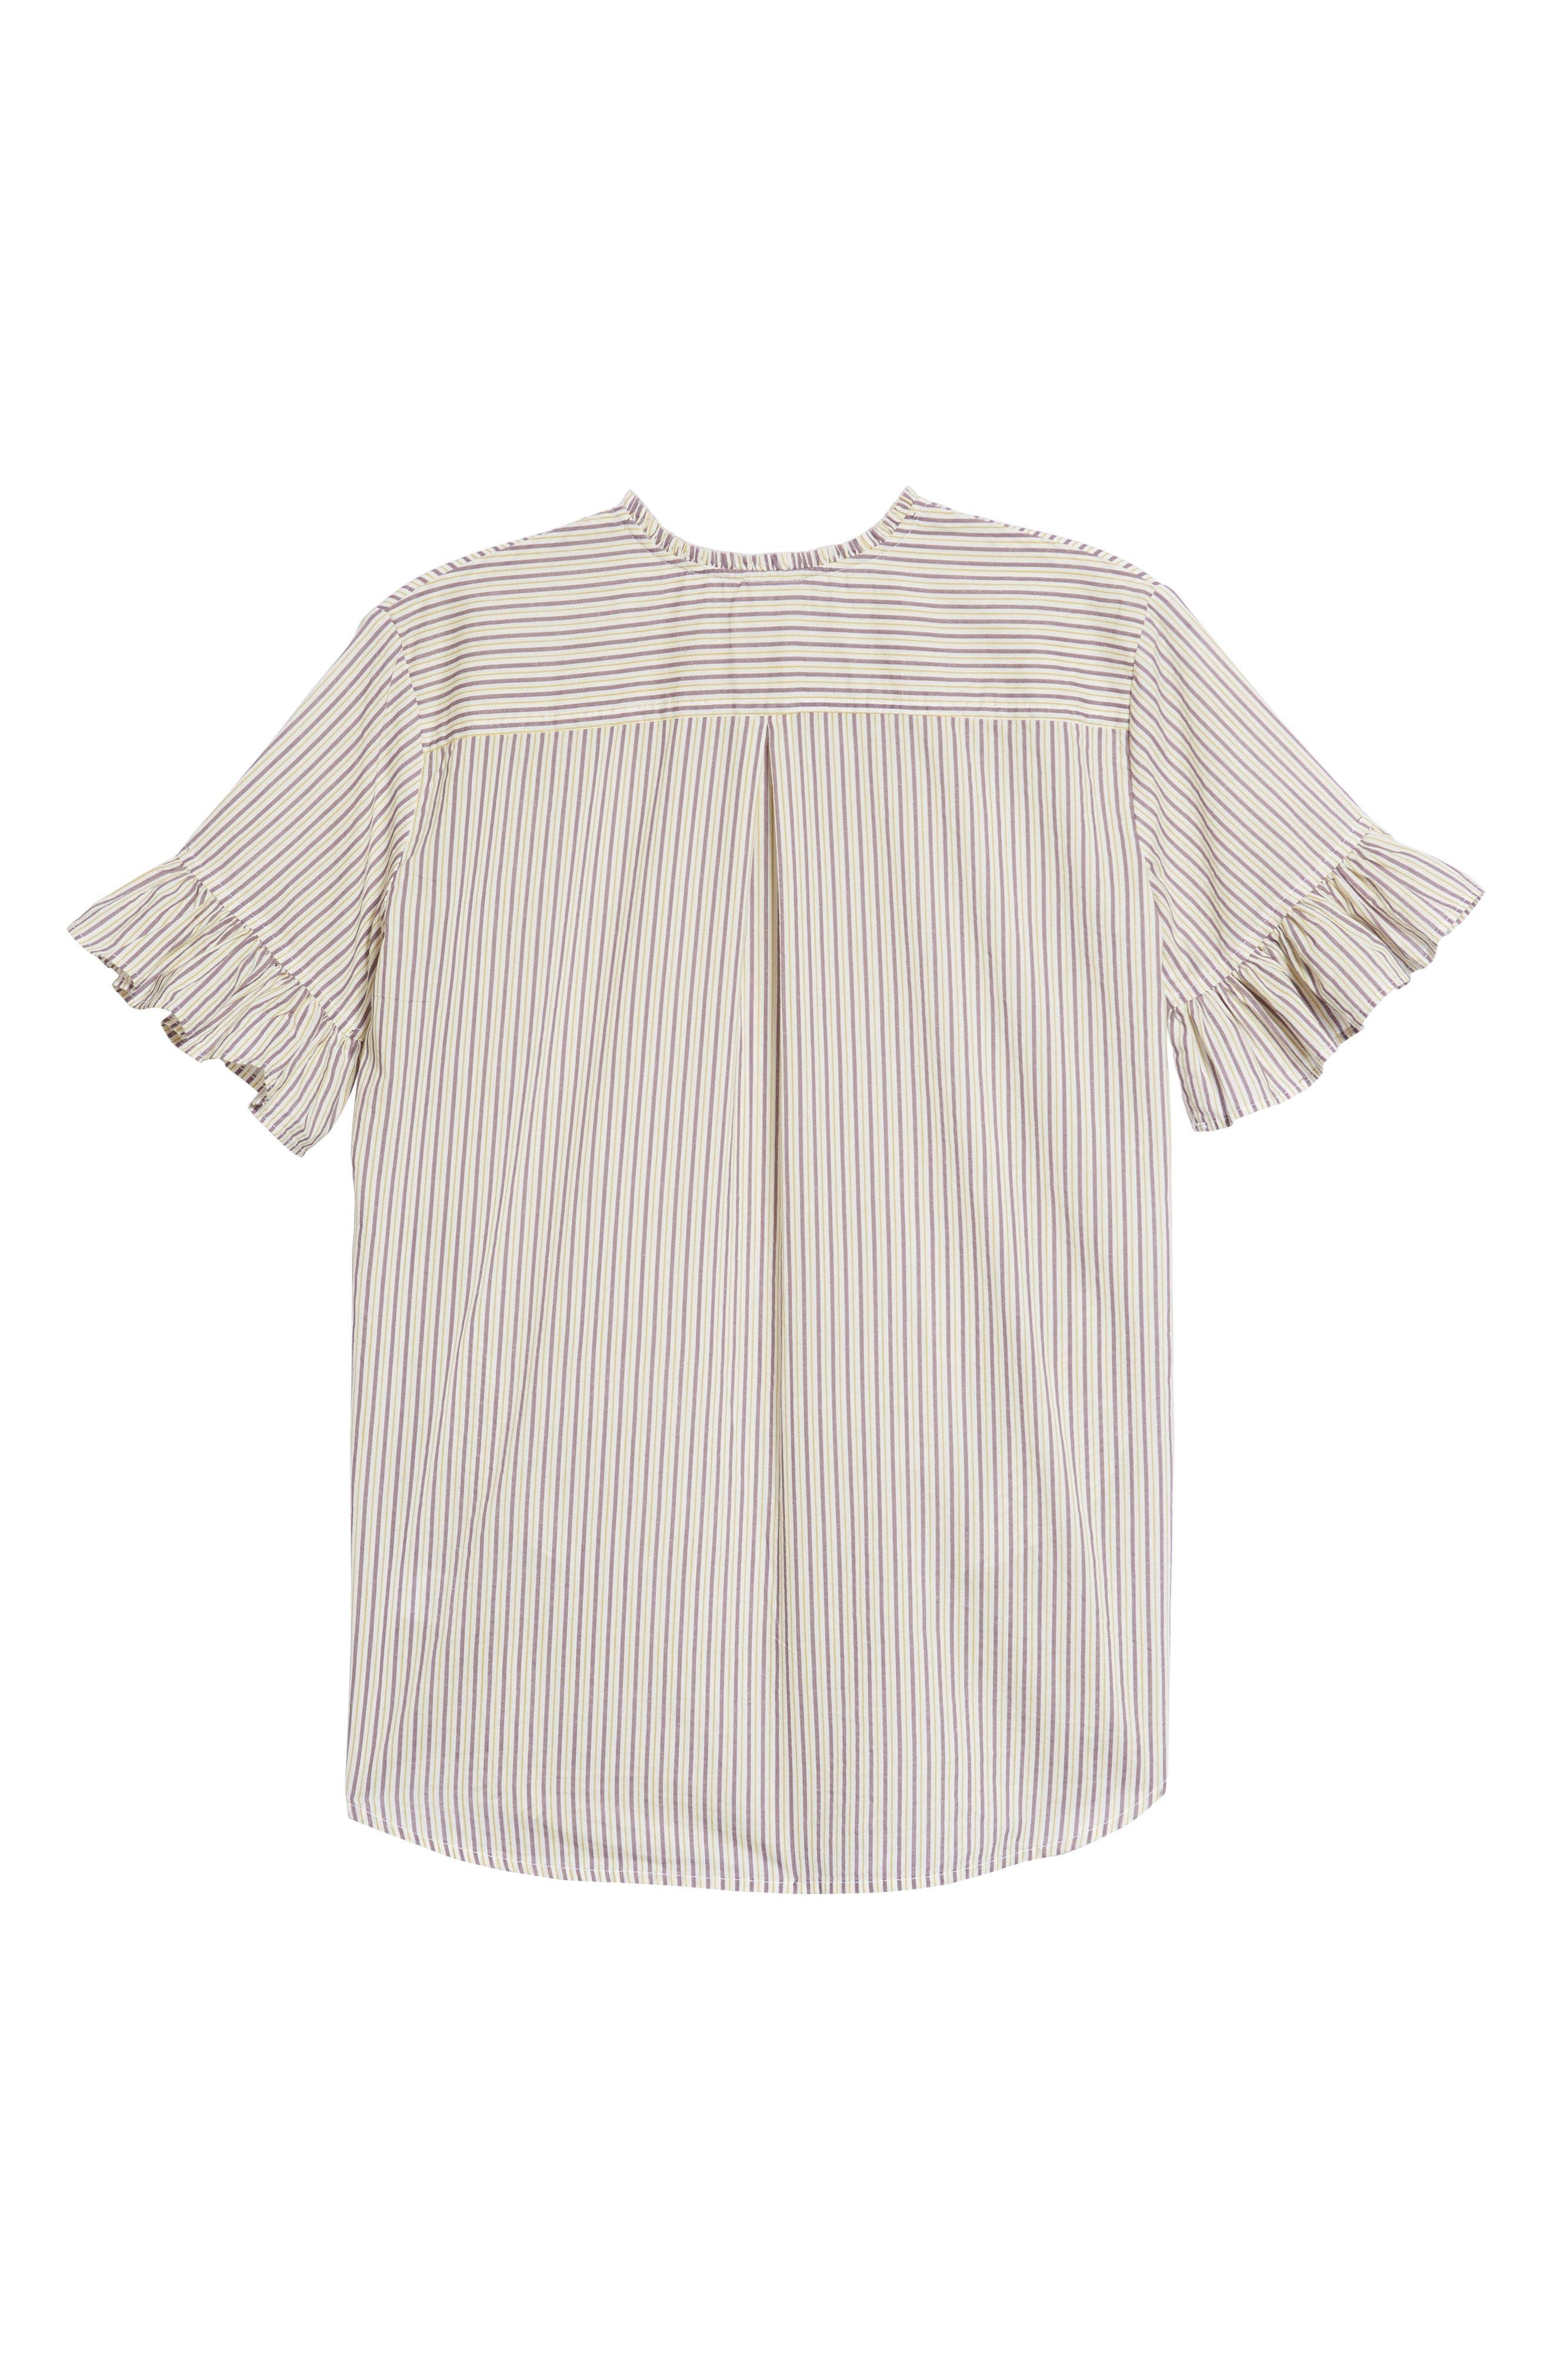 Ruffle Stripe Shirtdress,                             Alternate thumbnail 2, color,                             White Multi Stripe